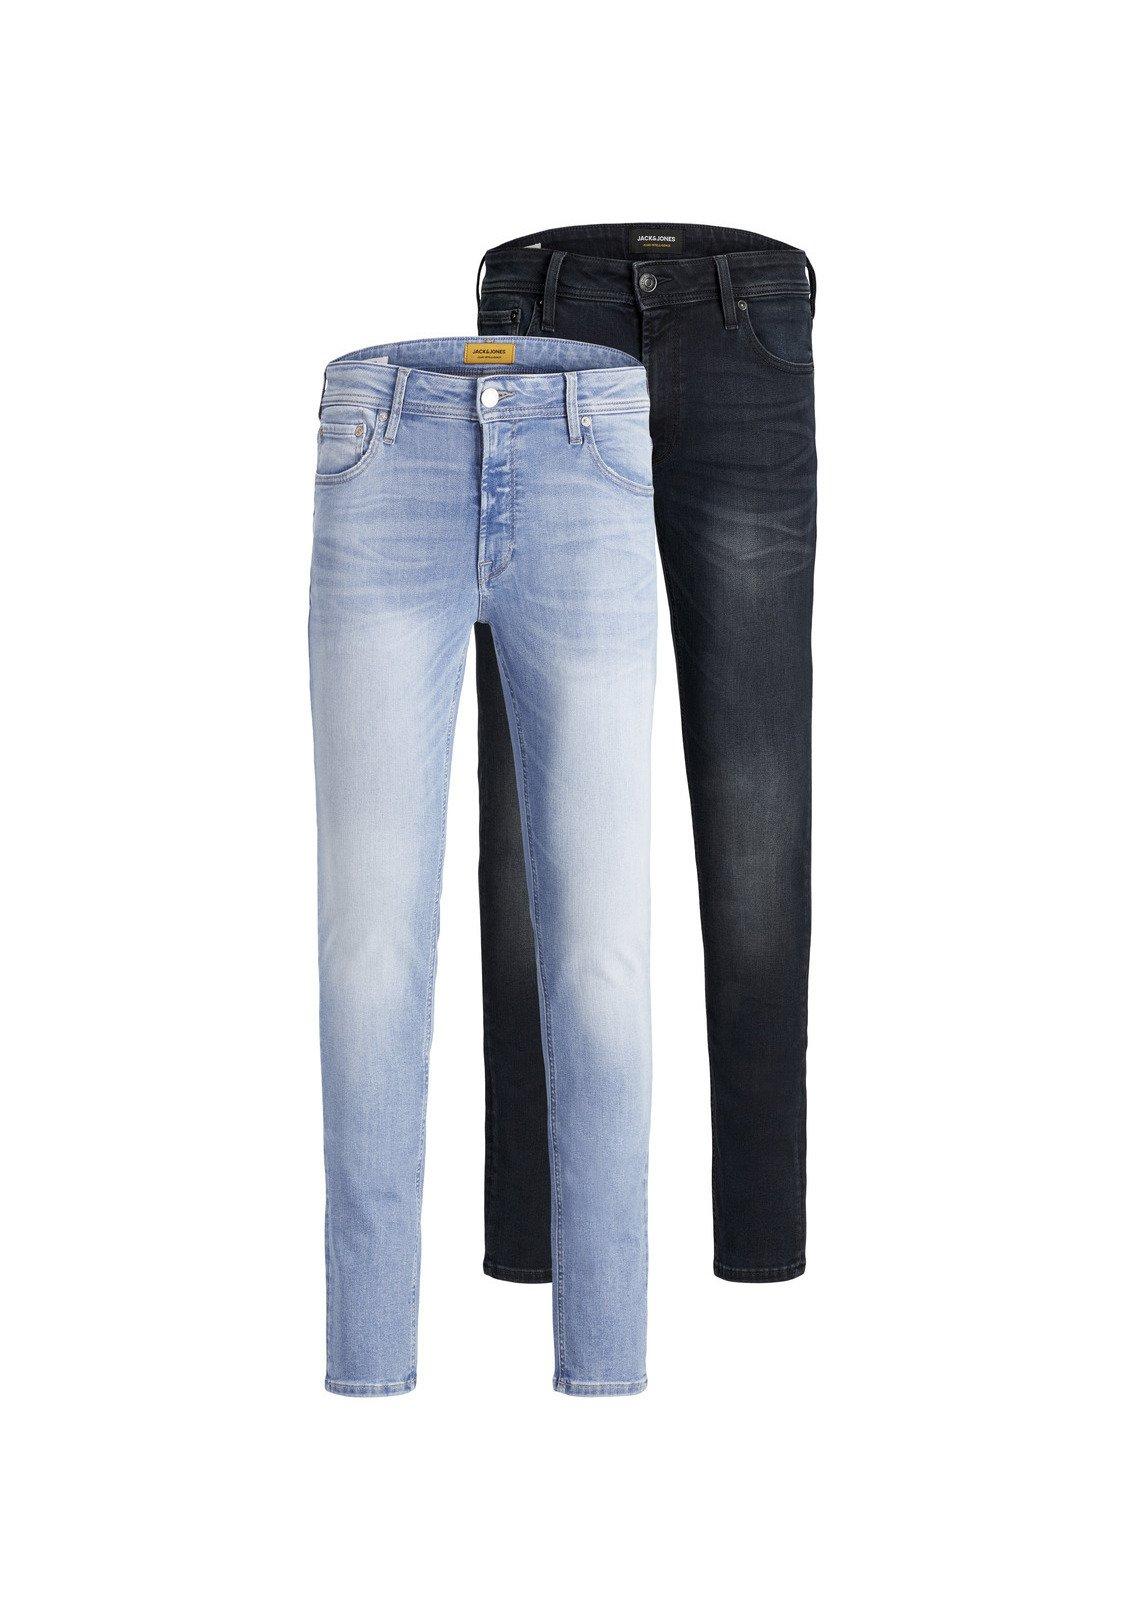 Uomo 2 PACK - Jeans slim fit